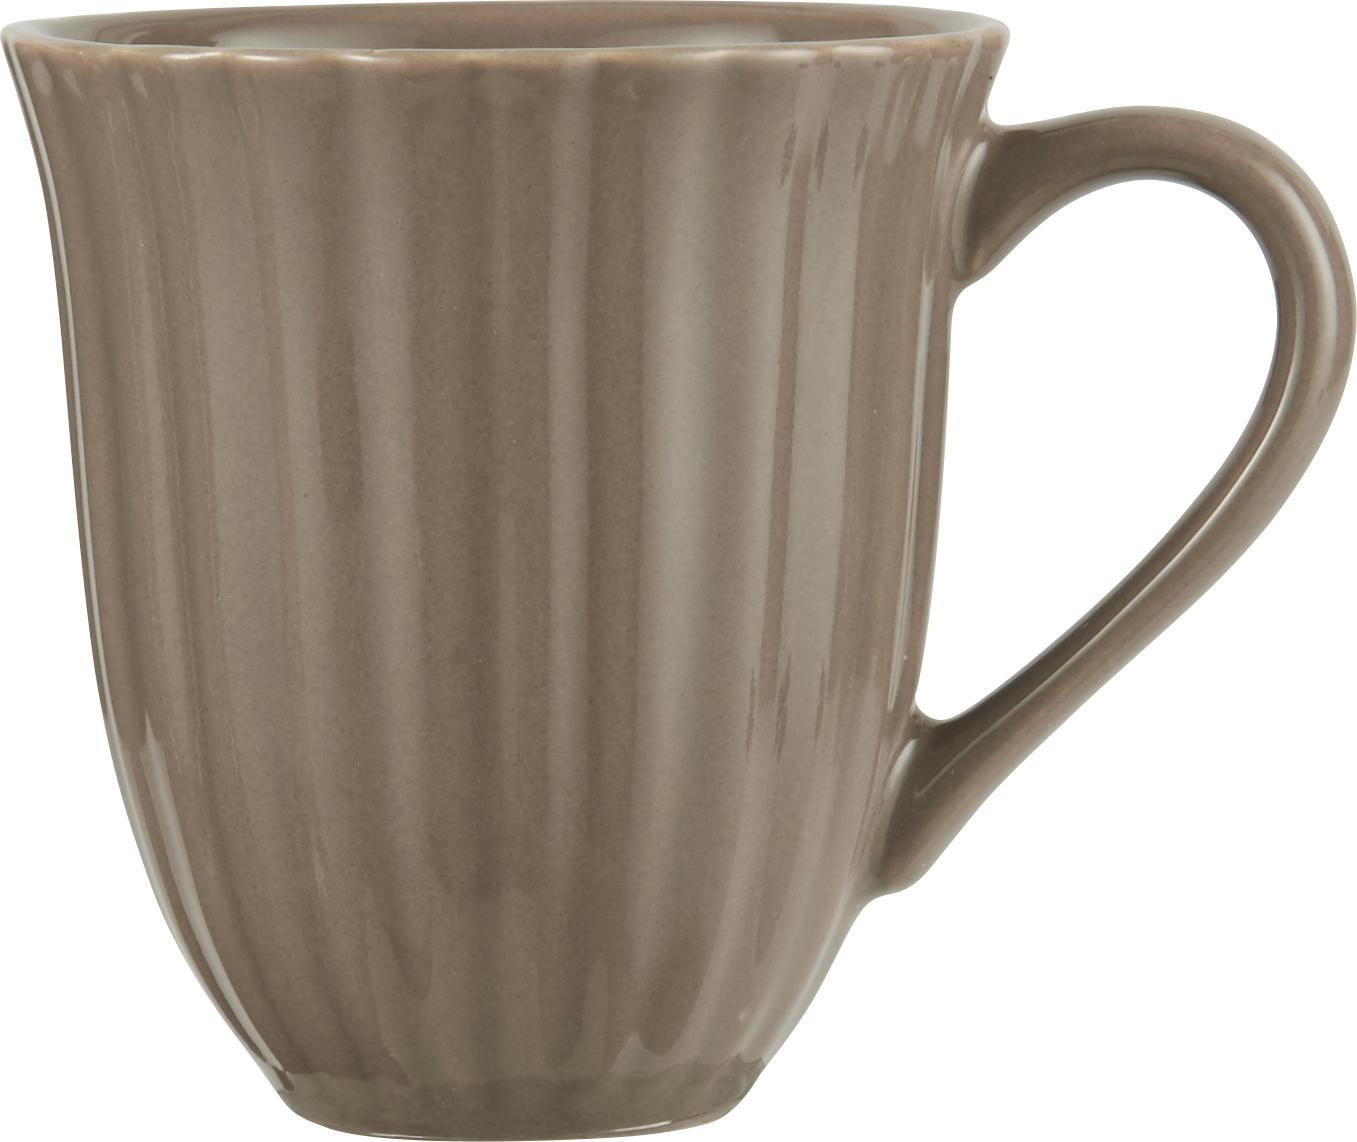 IB LAURSEN Hrnek Mynte Milky Brown, hnědá barva, keramika 280 ml